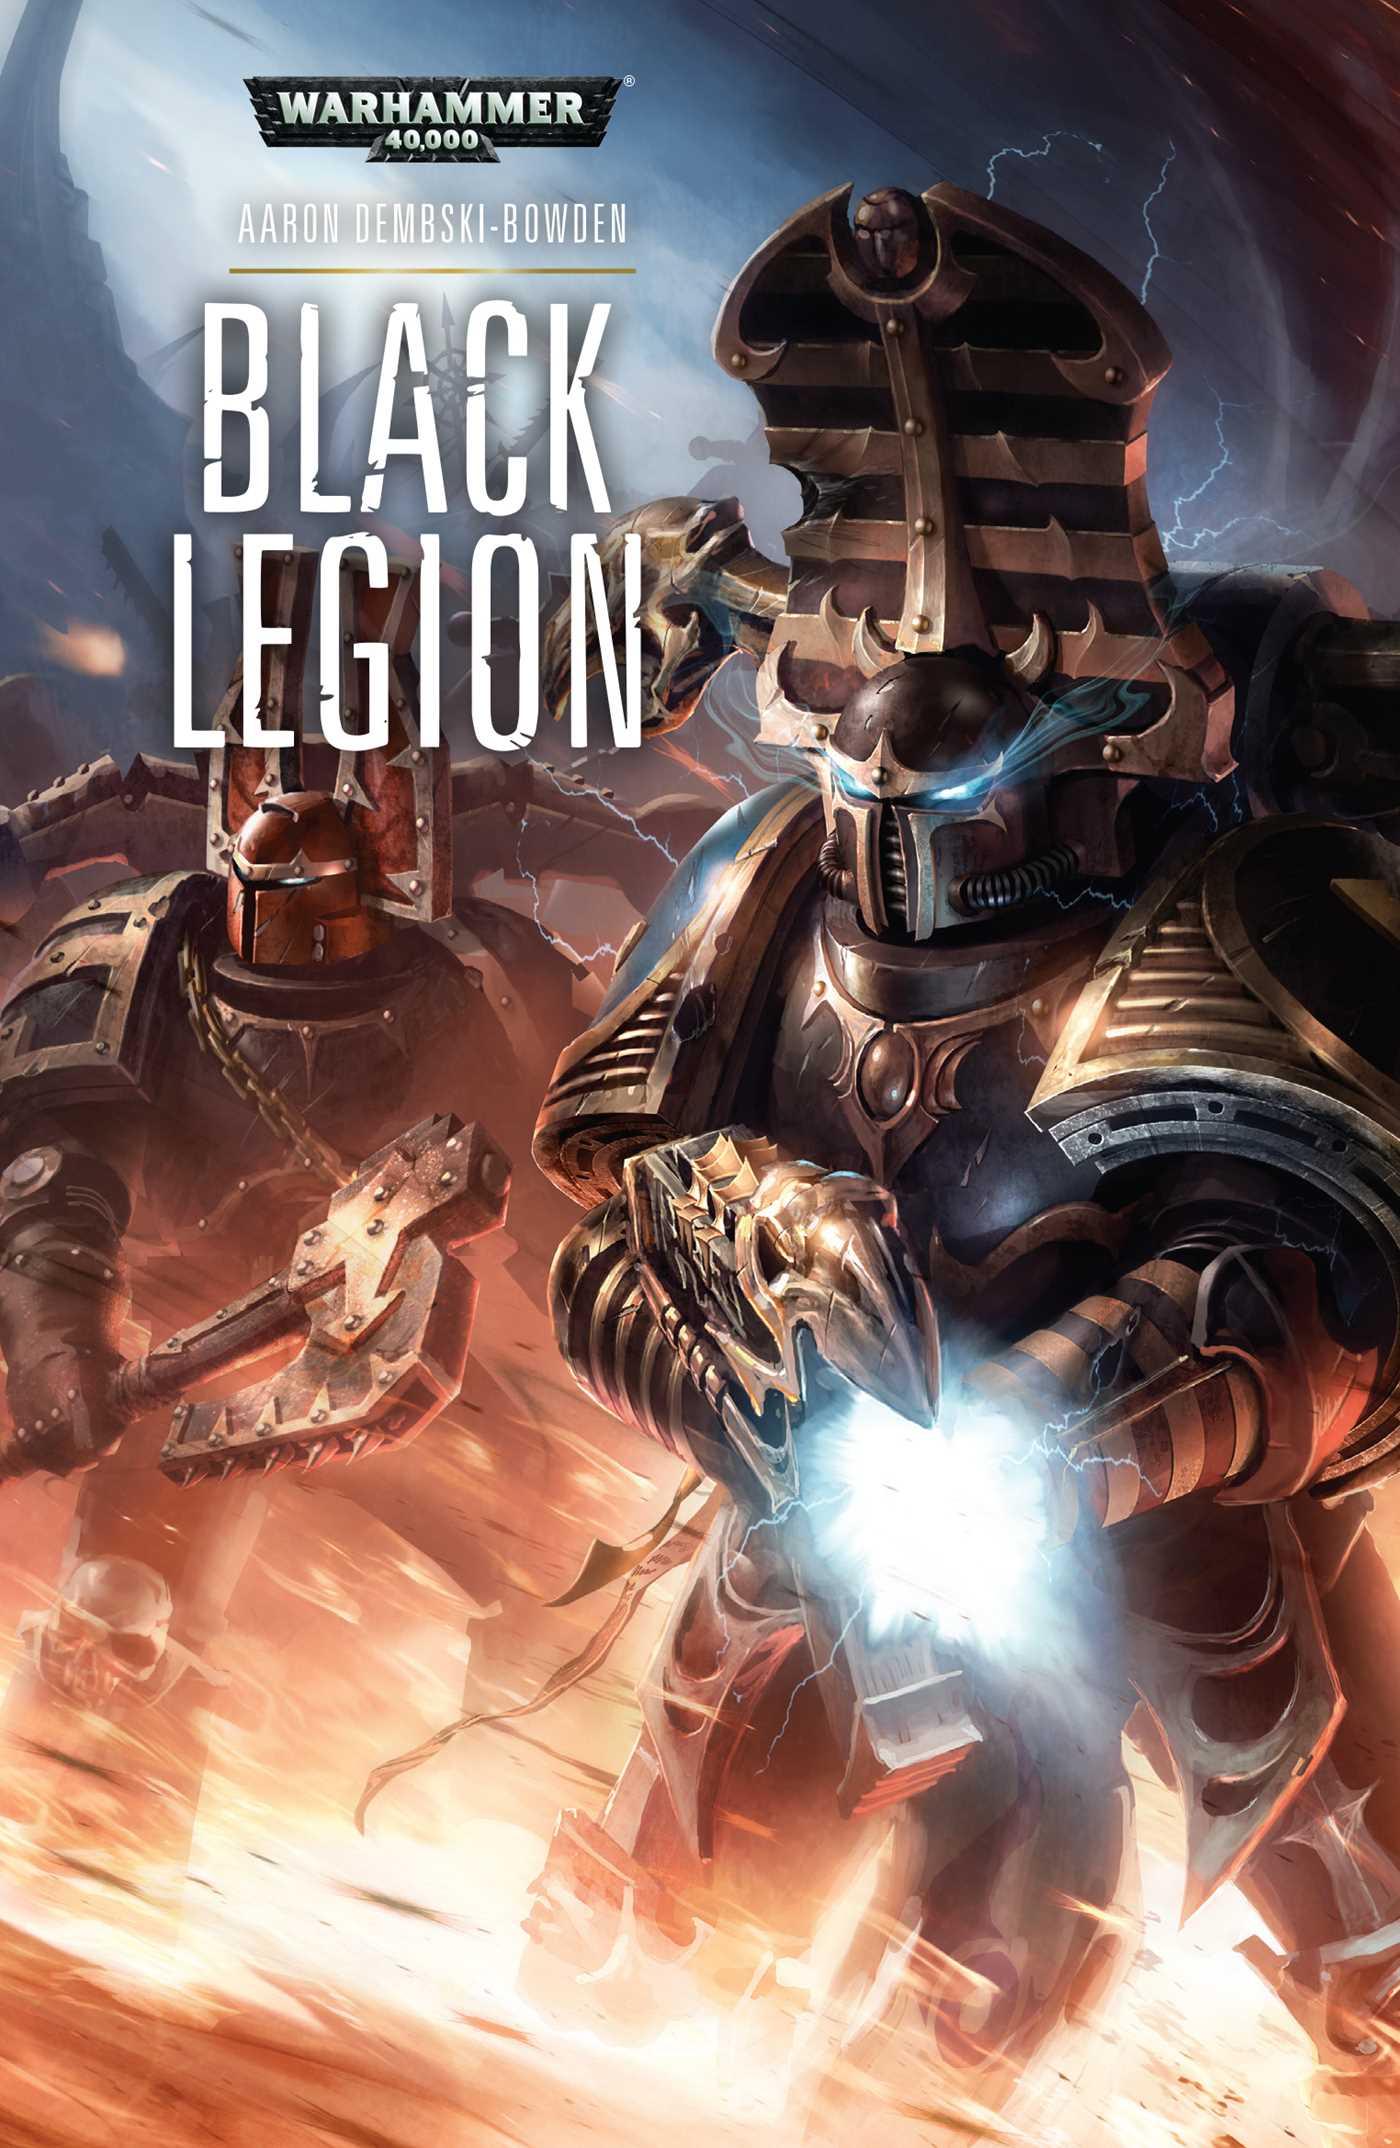 Black legion 9781784967536 hr